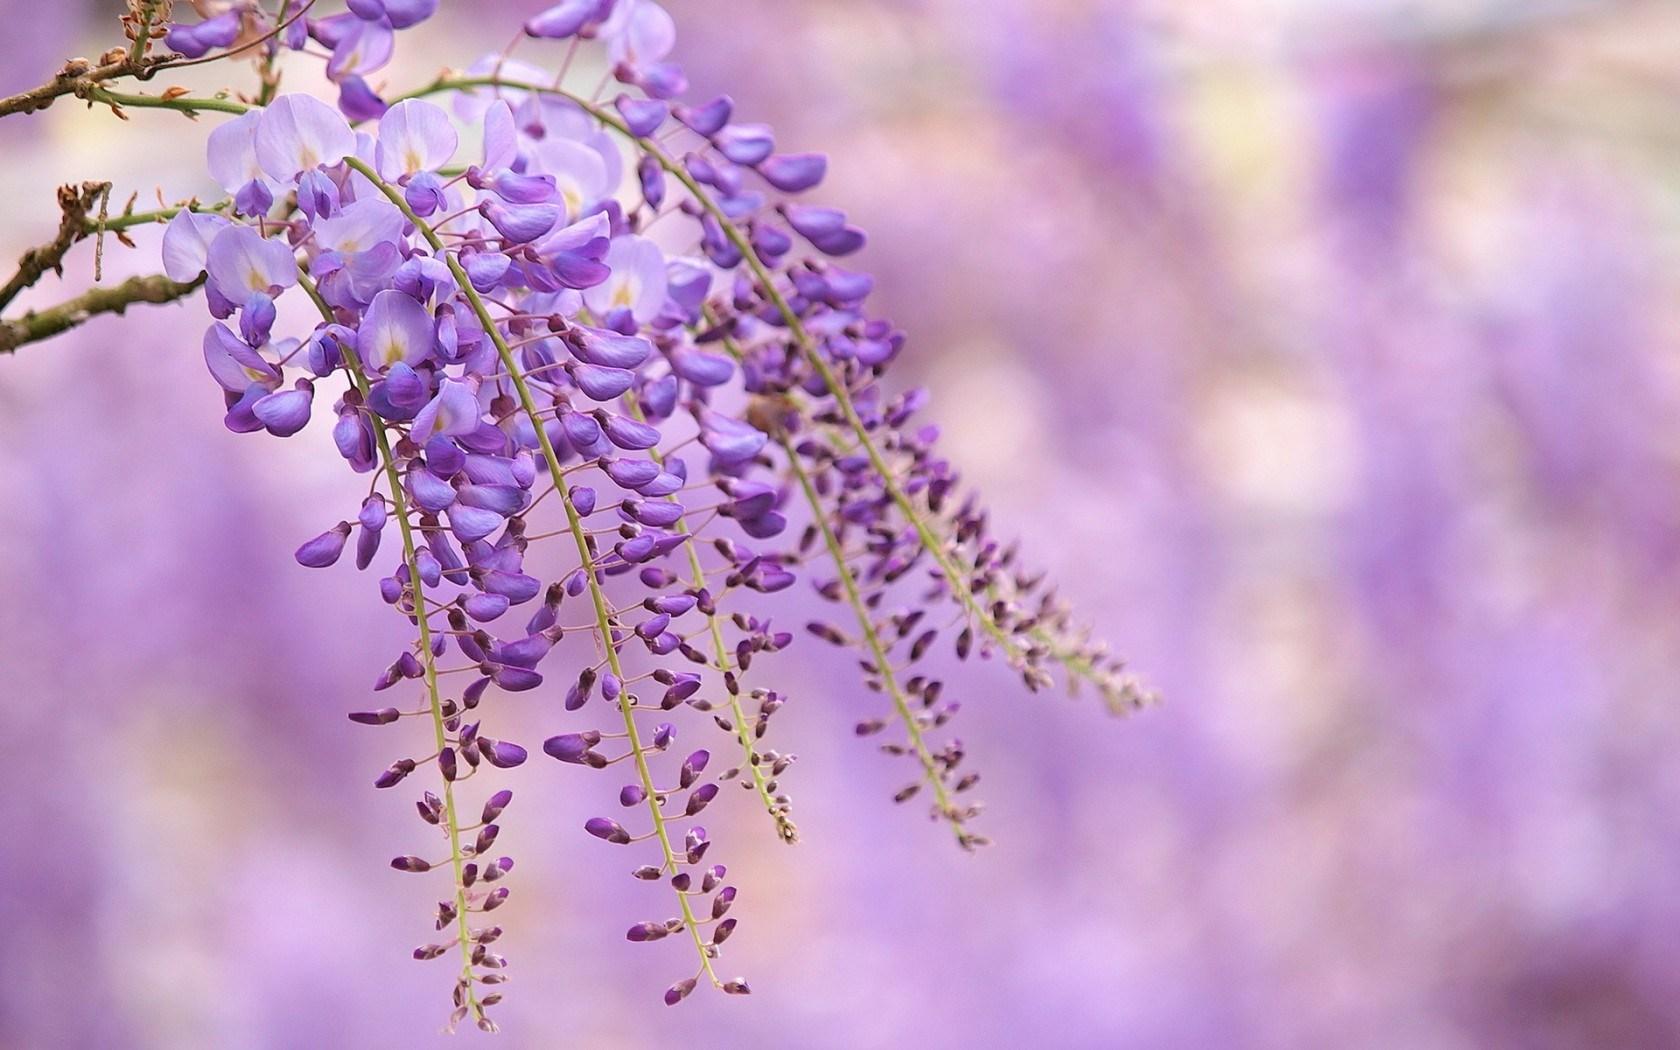 flowers lilac wisteria